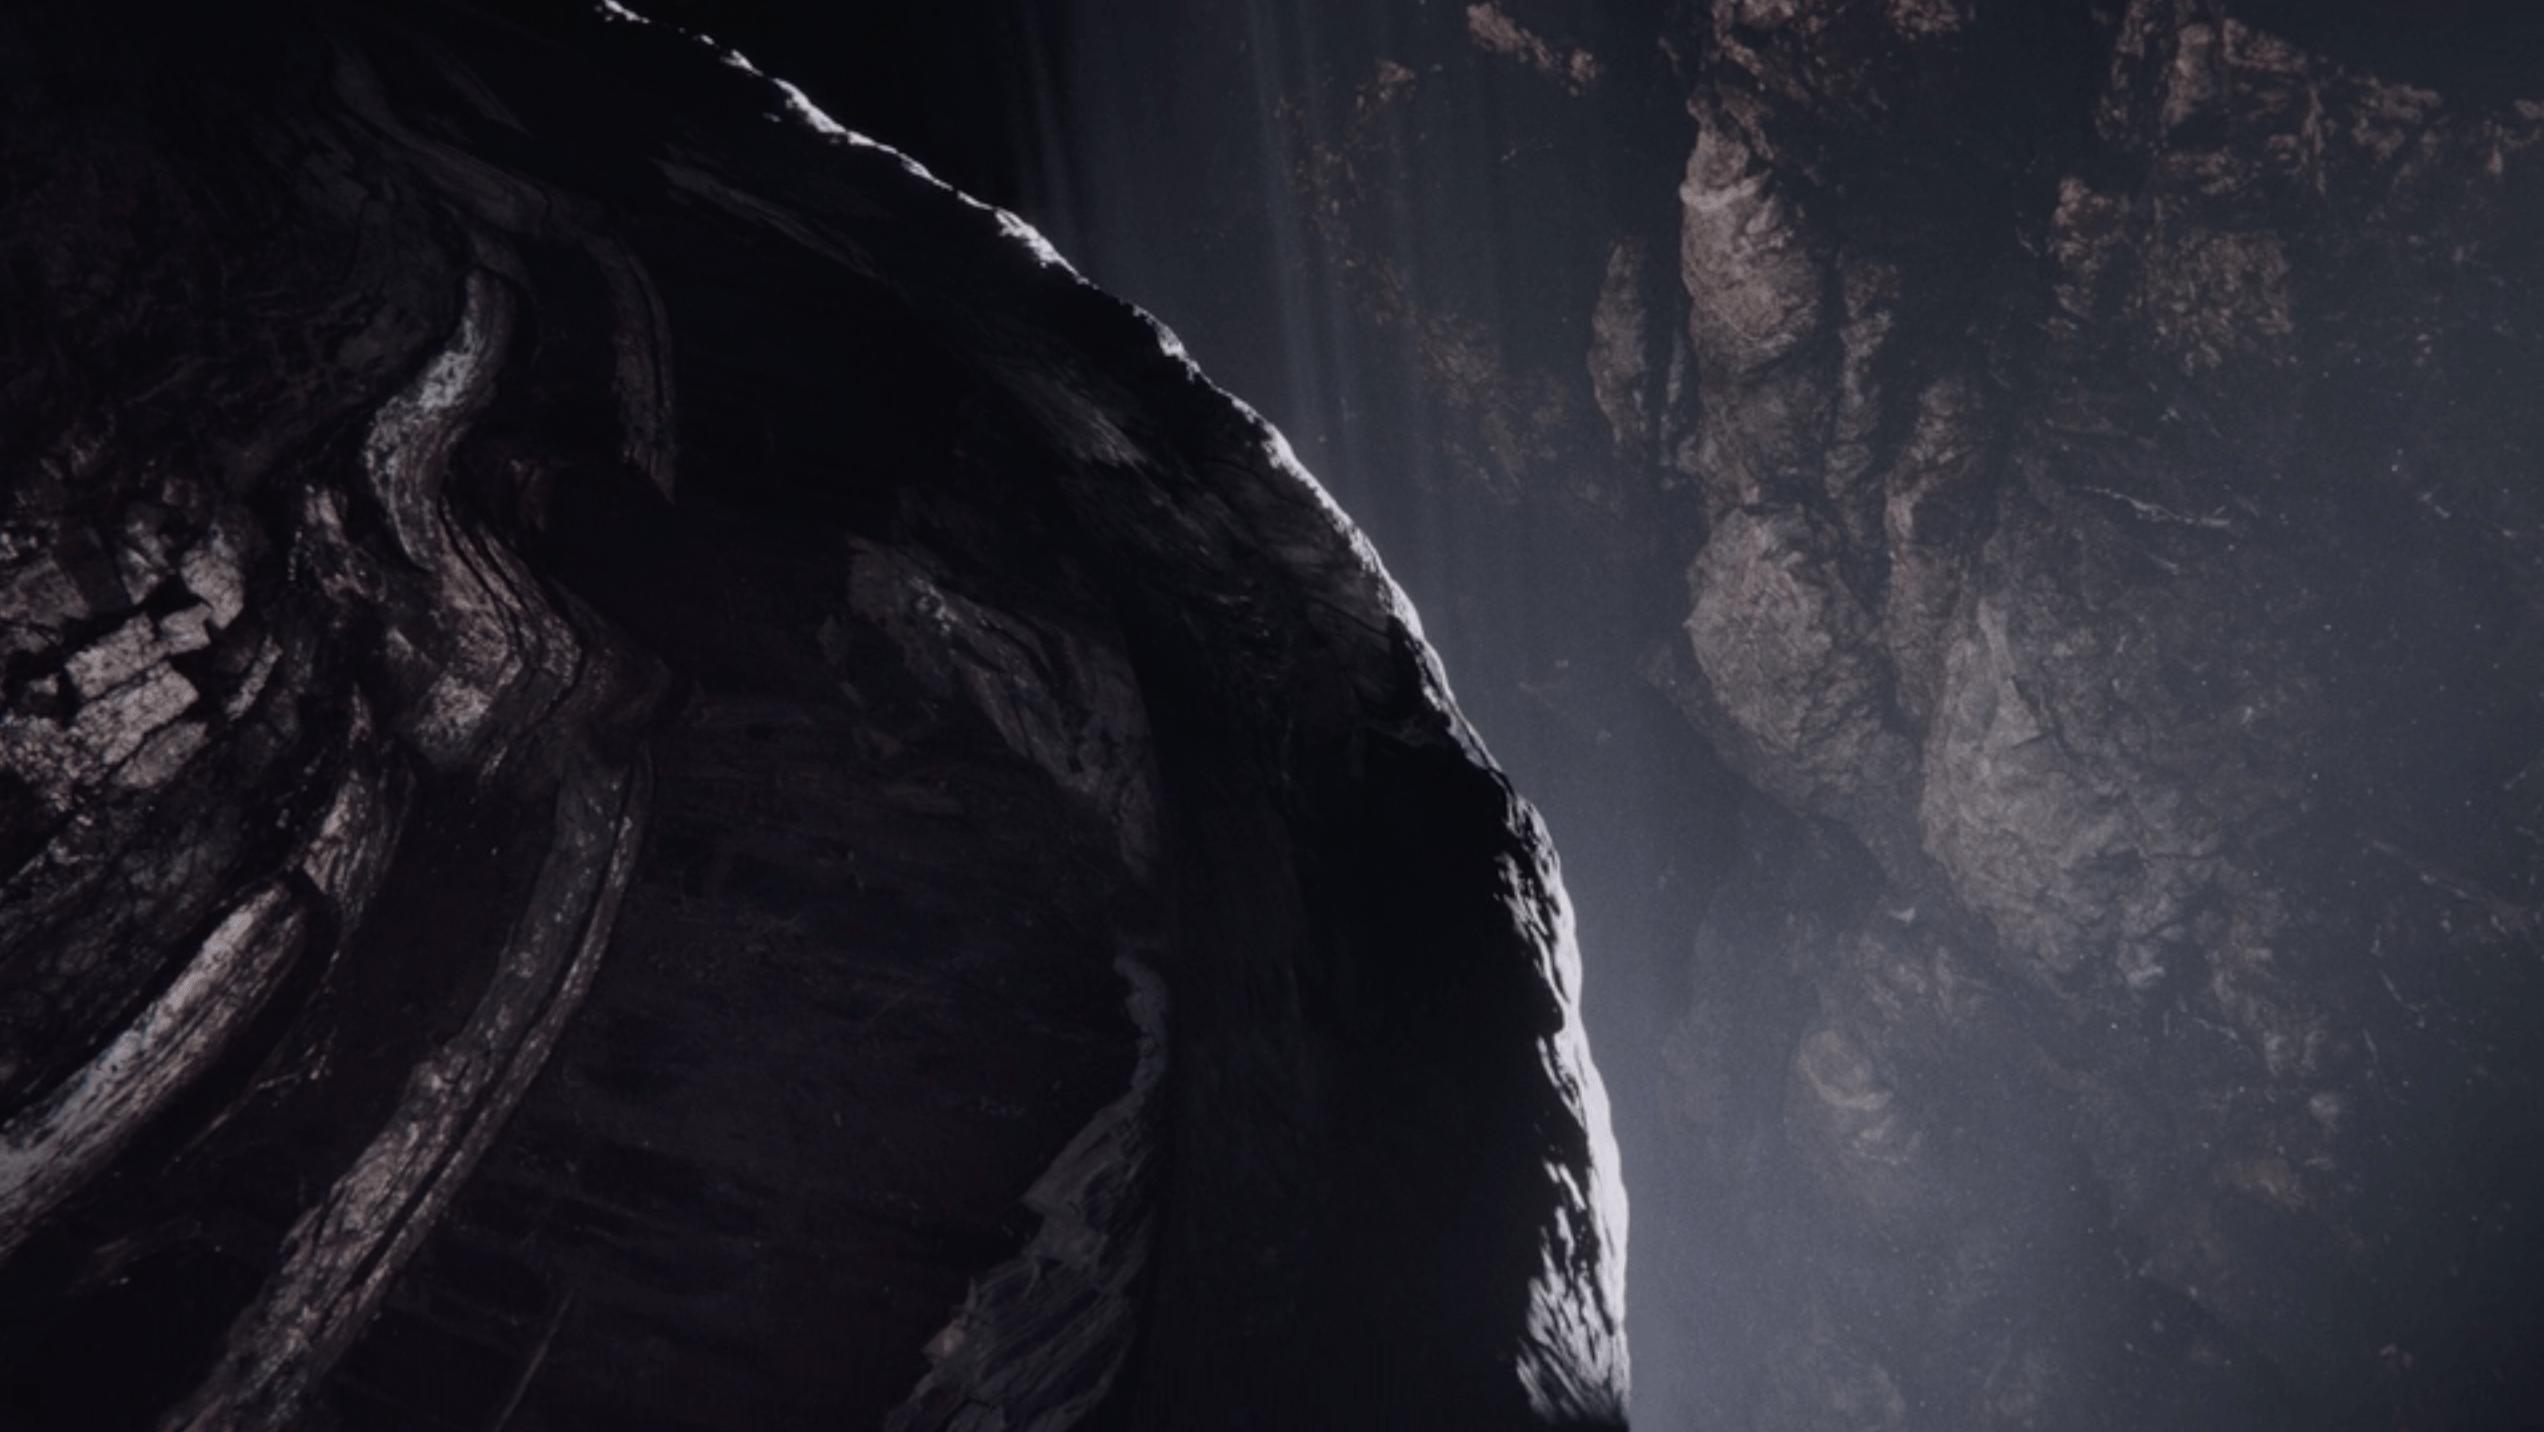 VFX dark cliffs revealing light